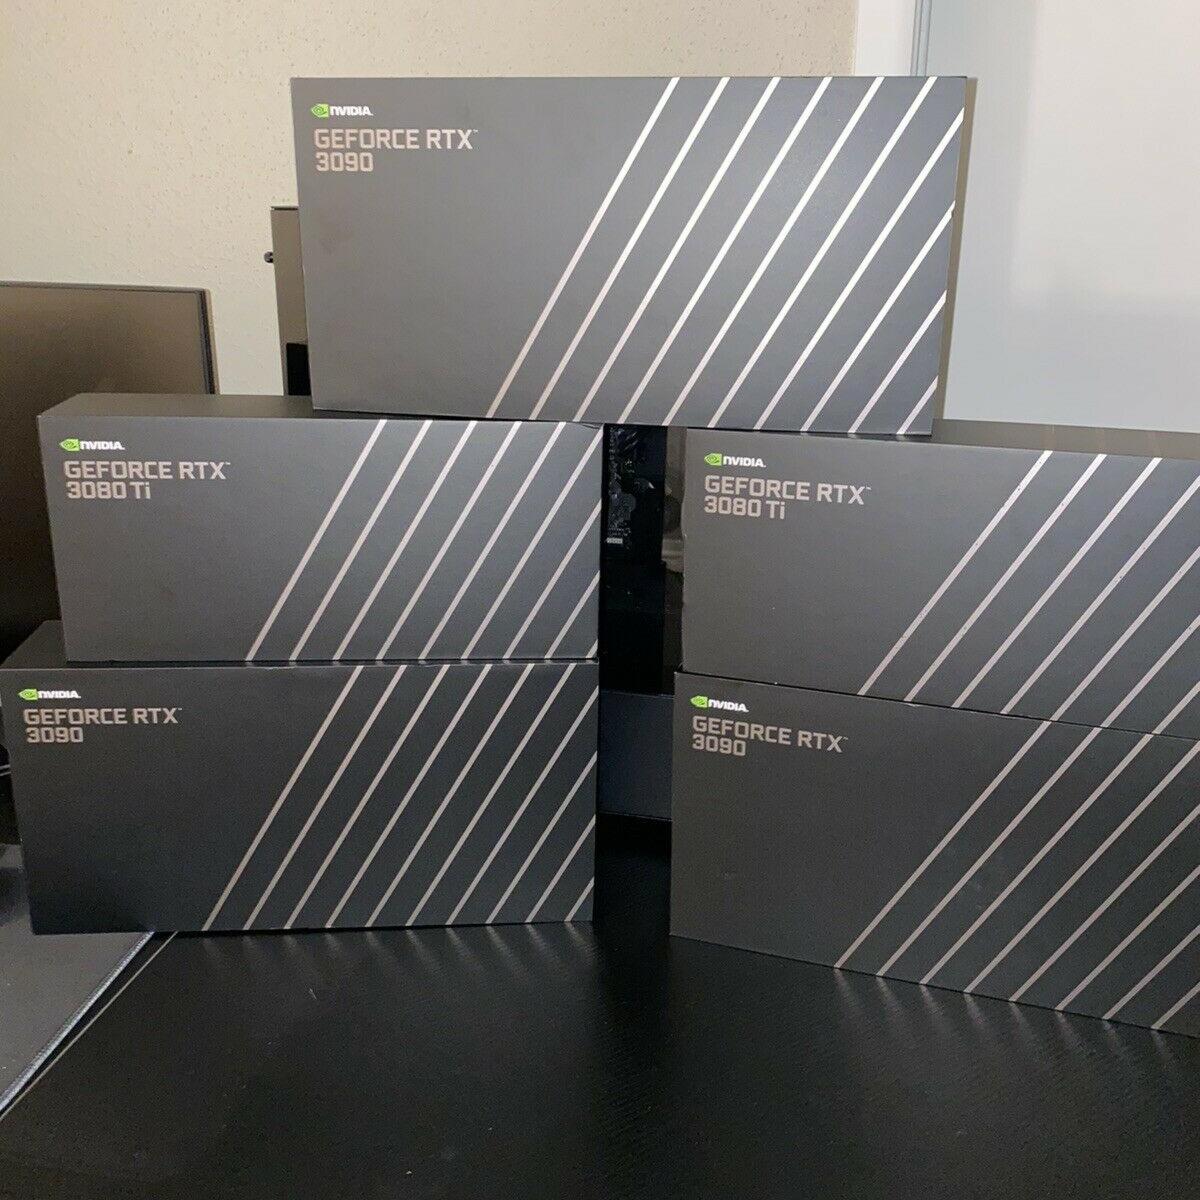 New NVIDIA GeForce RTX 3090 Founders Edition 24GB , EVGA GeForce RTX 3060